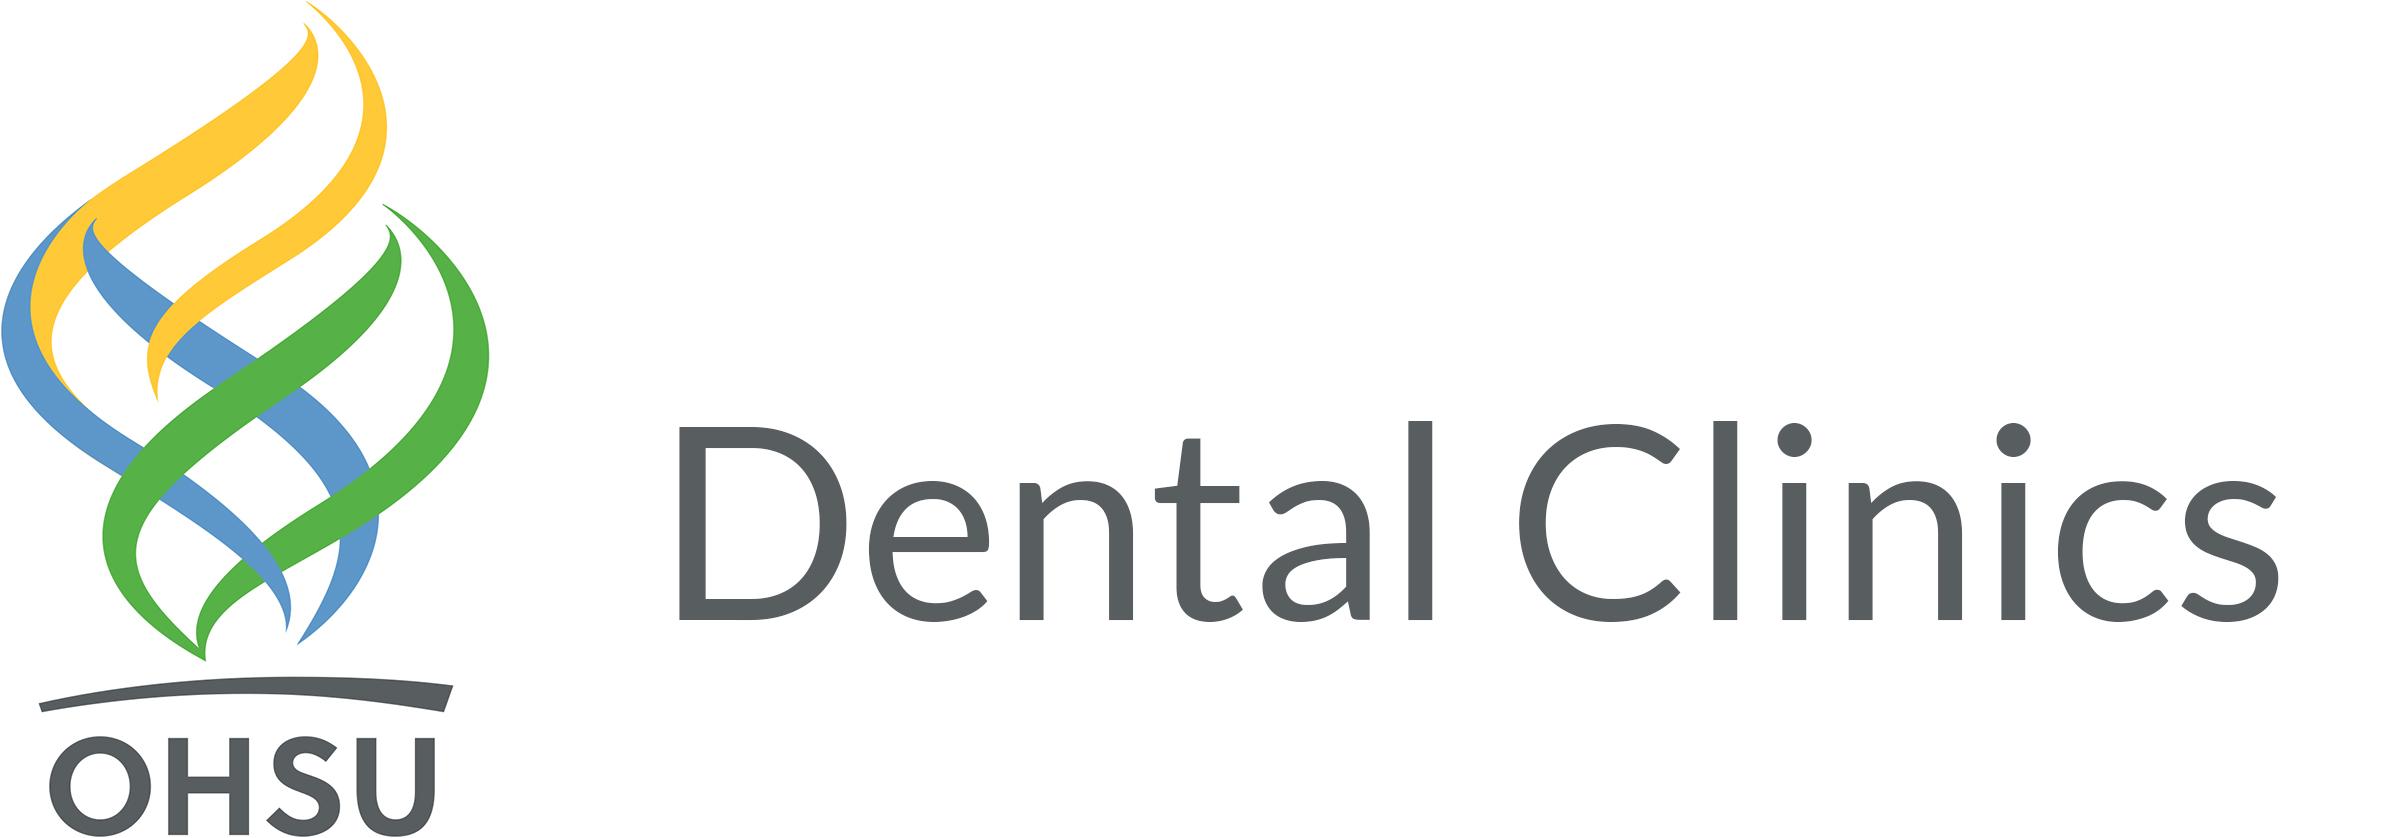 OHSU School of Dentistry   503-494-8867